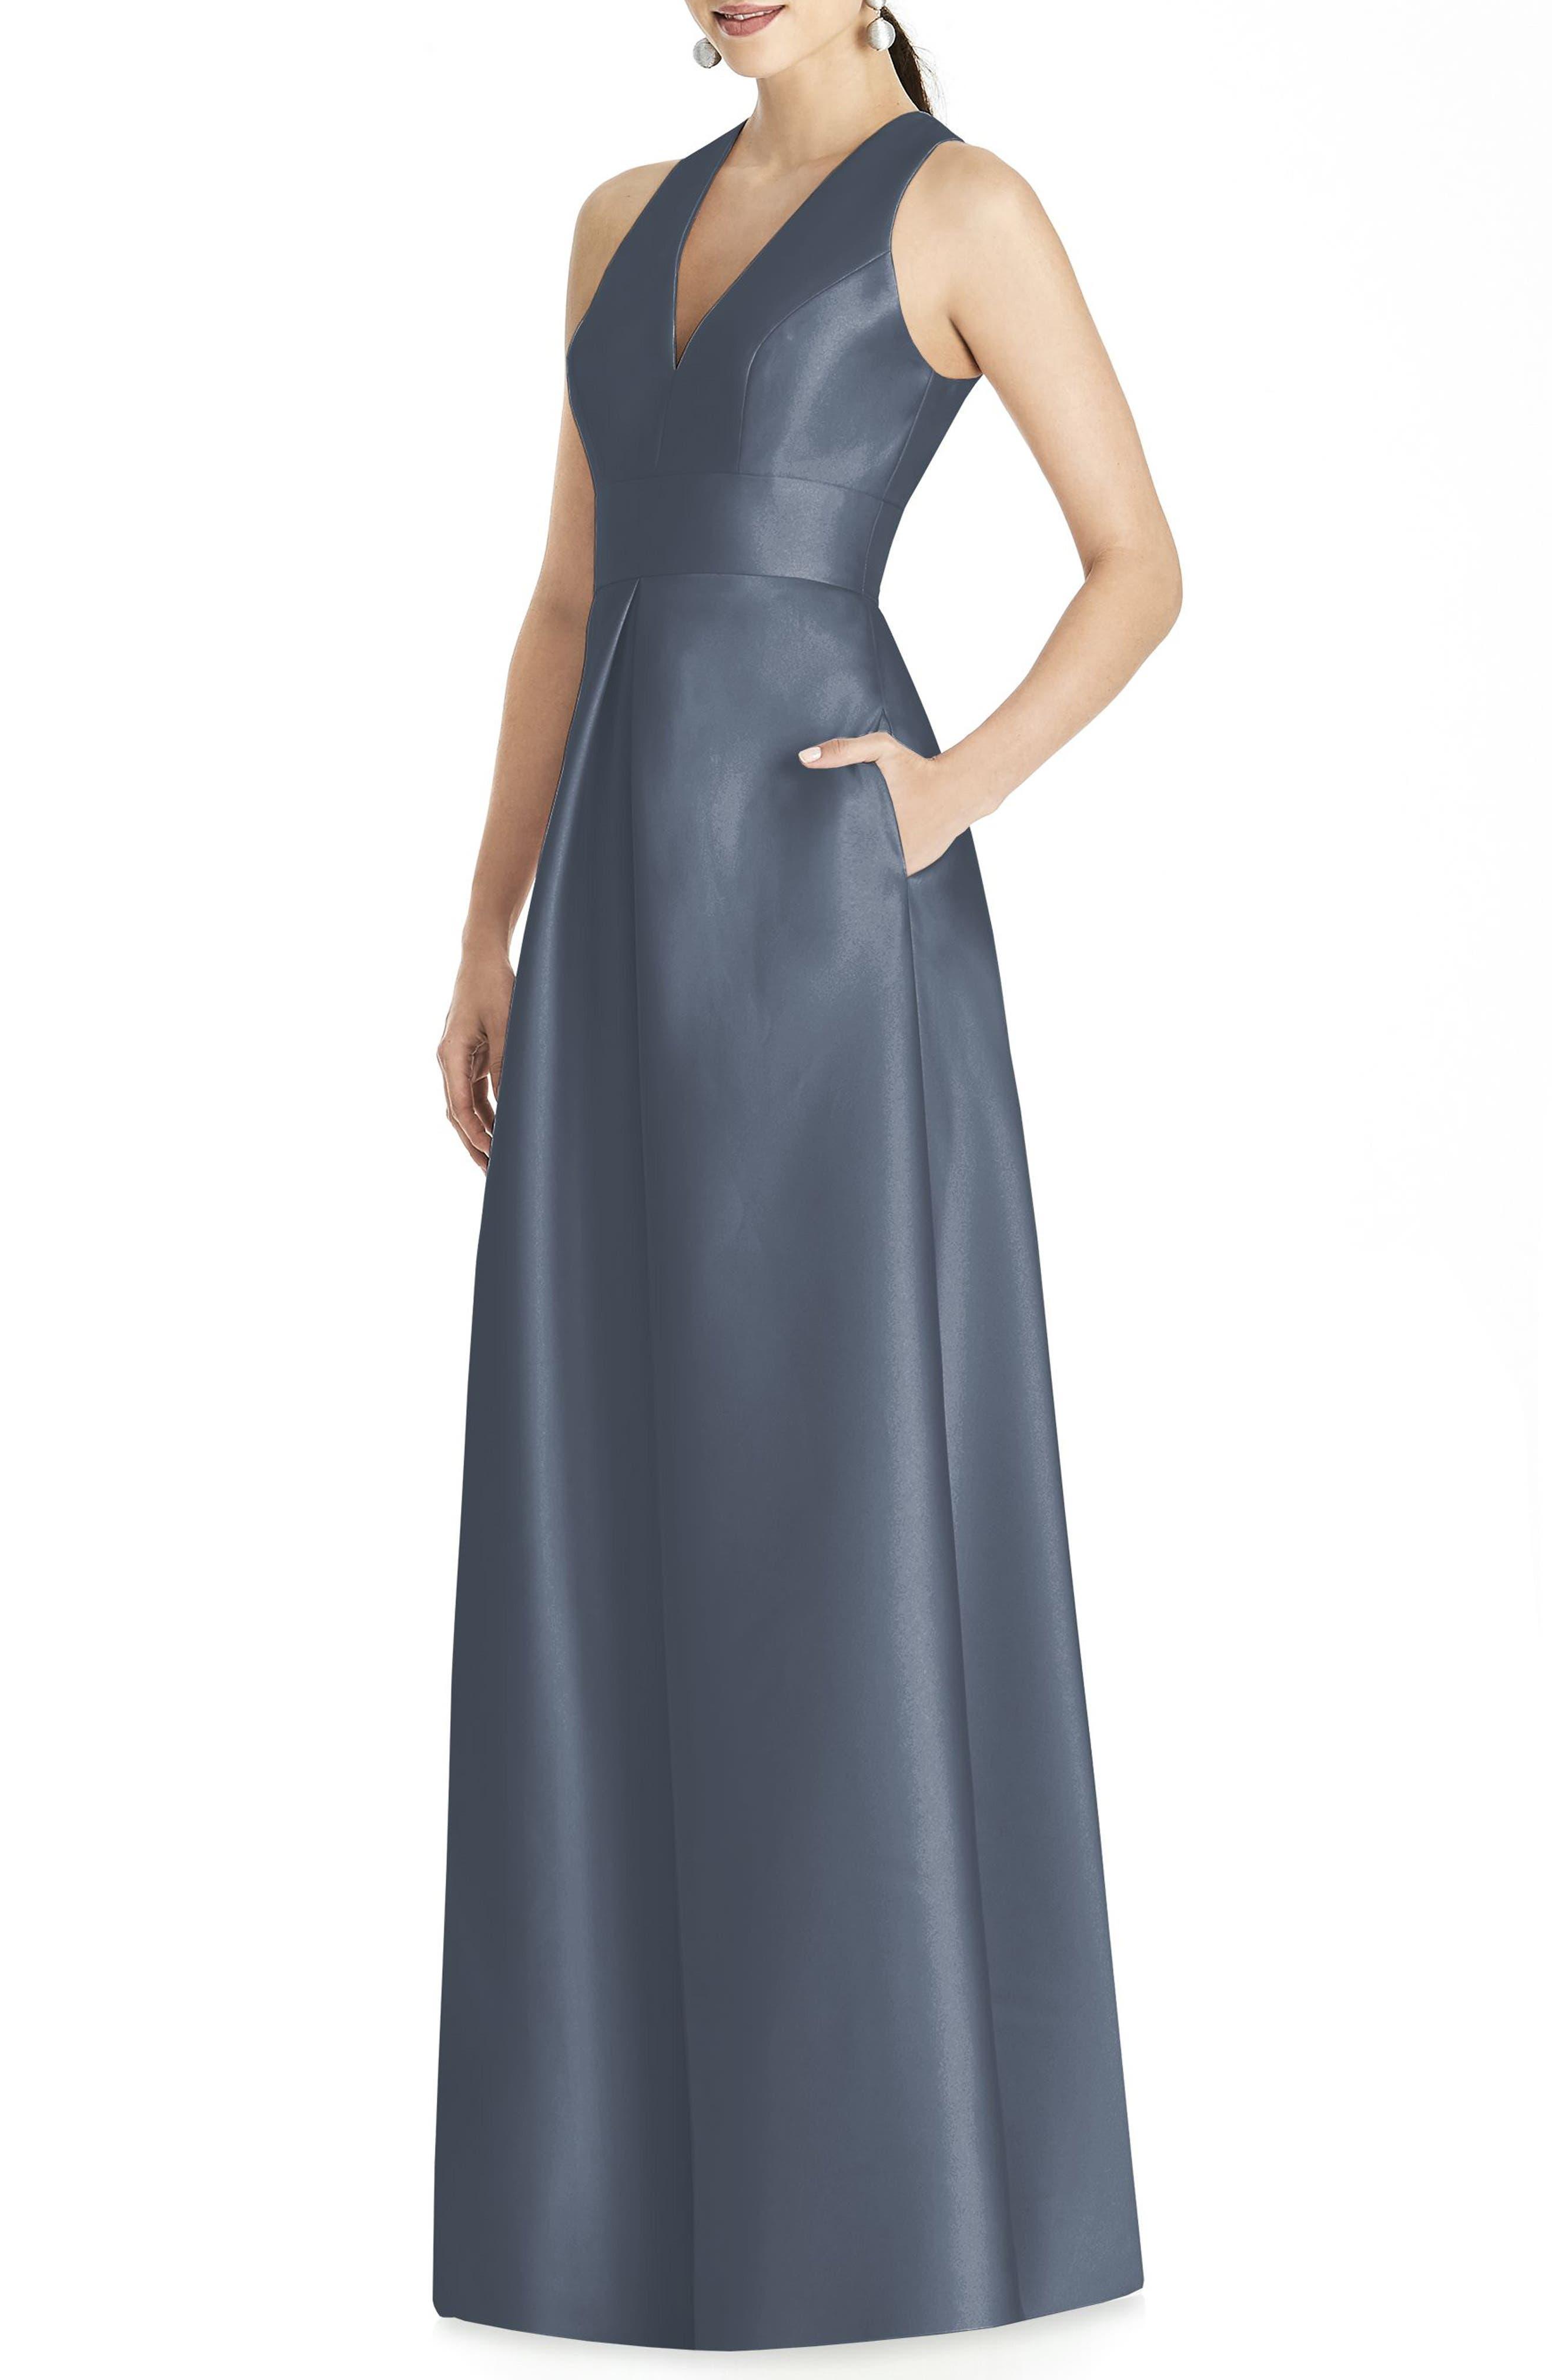 086fa5d093fa65 Women's Empire Waist Dresses   Nordstrom